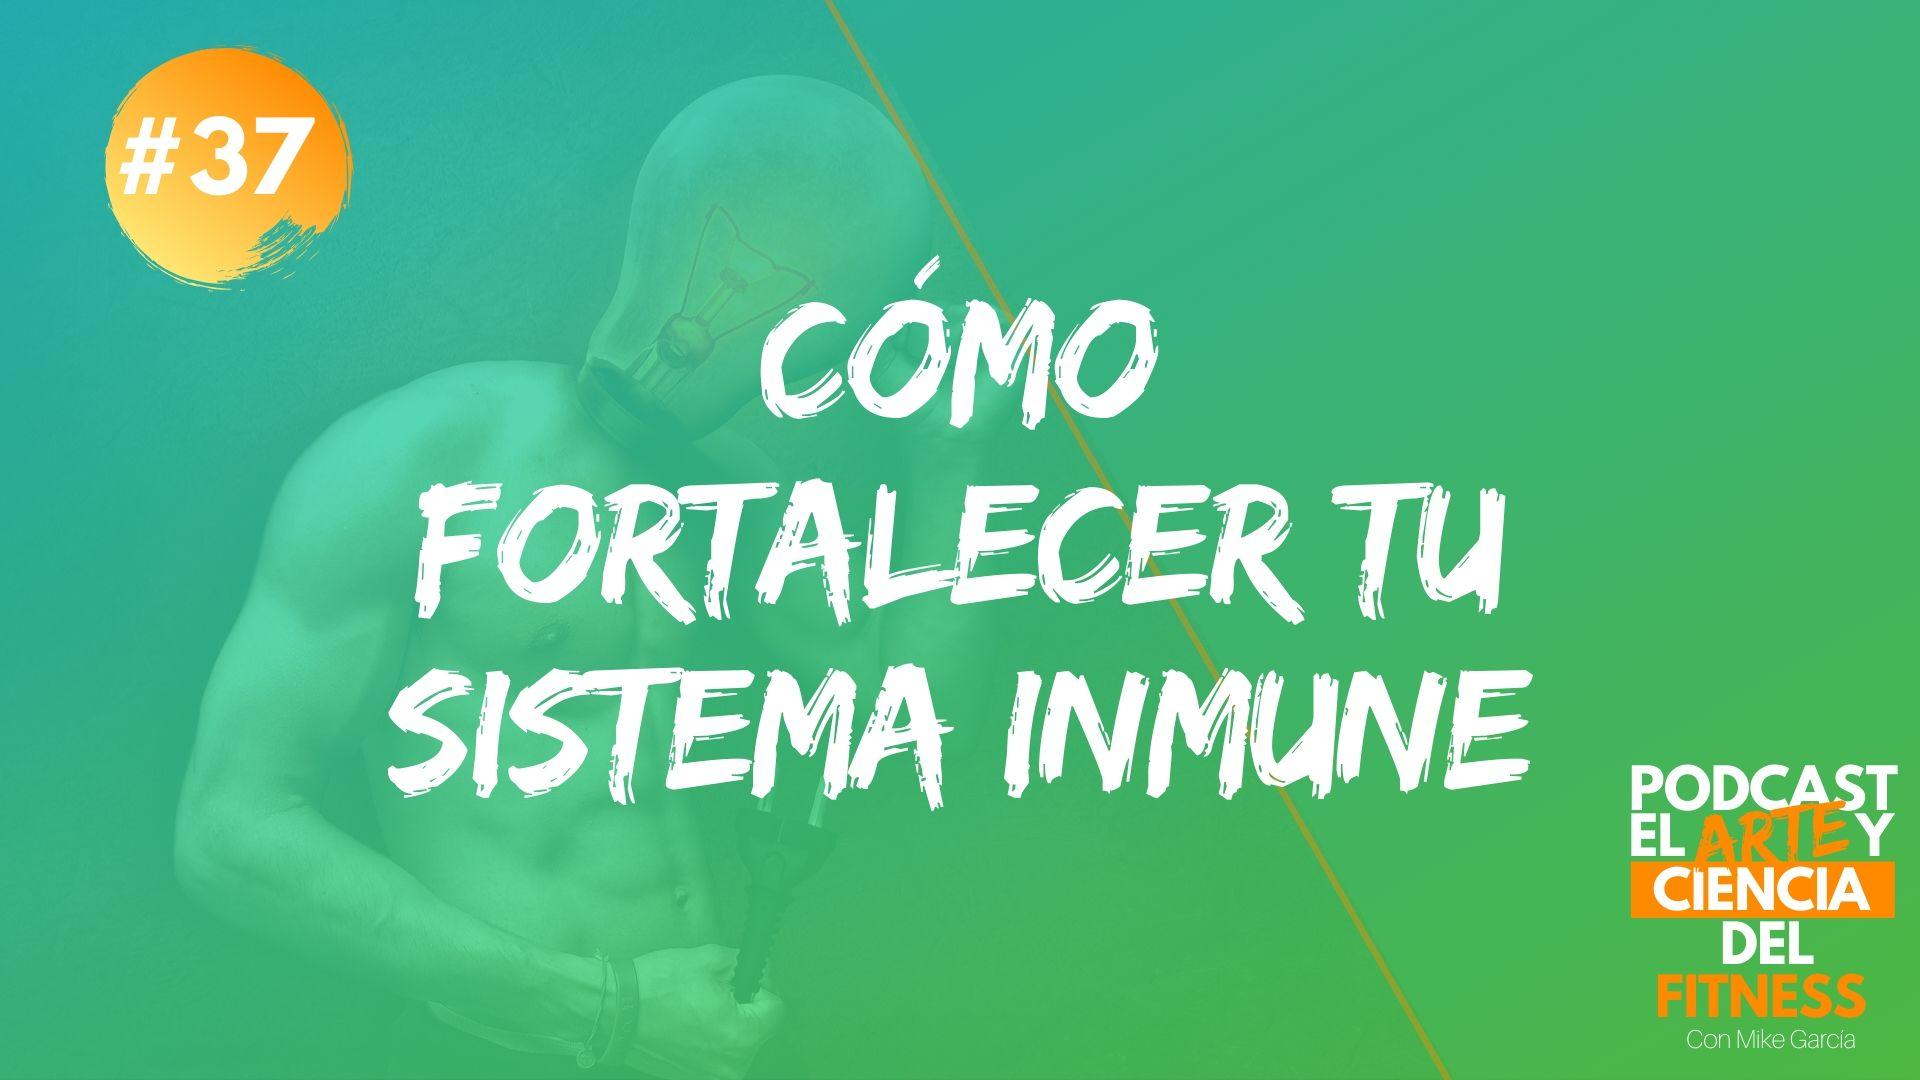 Podcast #37: Cómo Fortalecer Tu Sistema Inmune